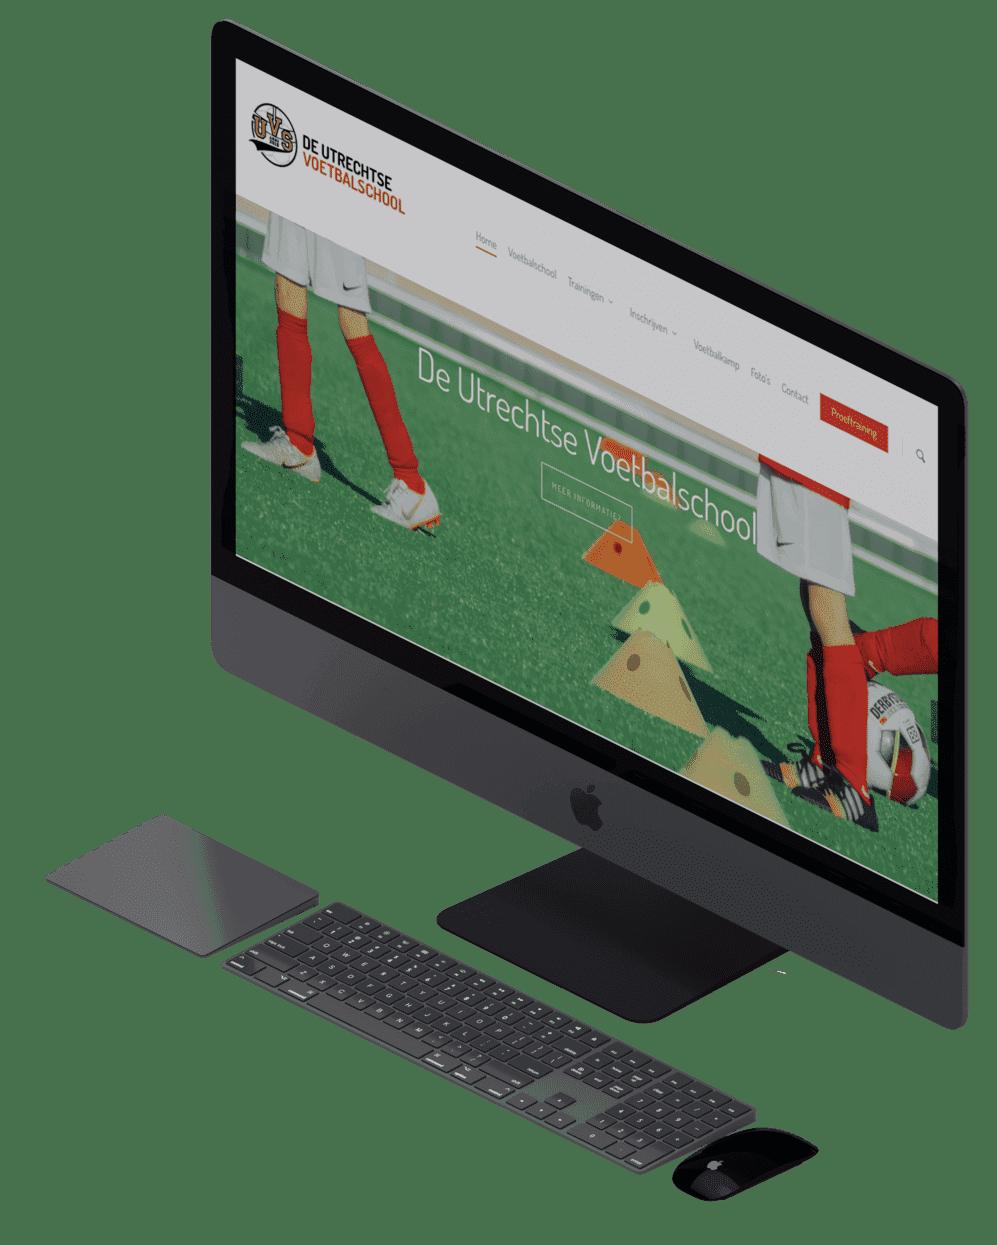 KDWebdesign-internetbureau-bilthoven-klant-de-utrechtse-voetbalschool-2